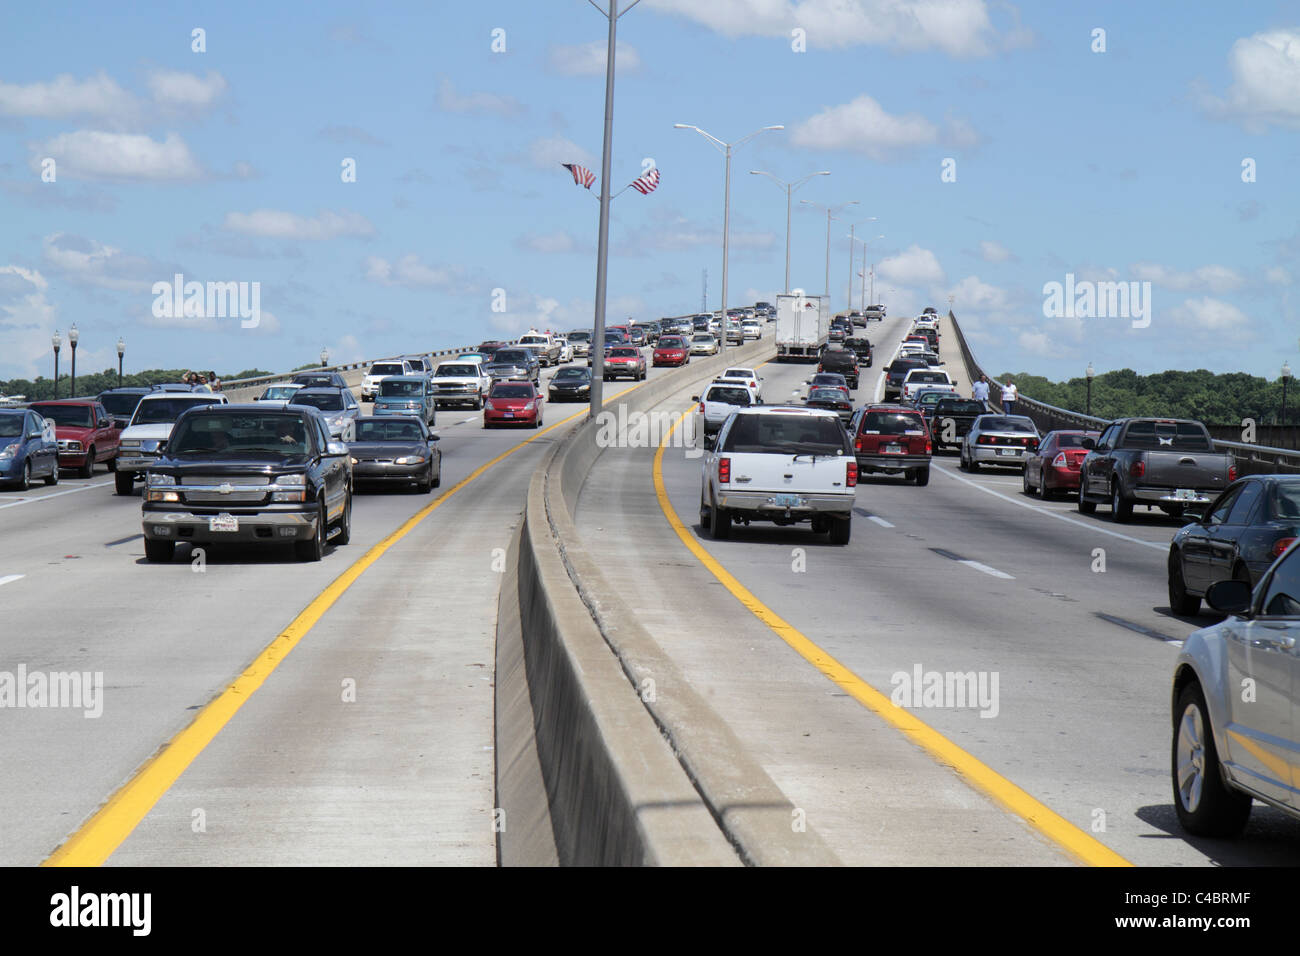 Florida, FL, Süd, Putnam County, Palatka, St. John's River Bridge, illegal geparkte Fahrzeuge, Autos, Verkehr, Sightseeing Stockfoto